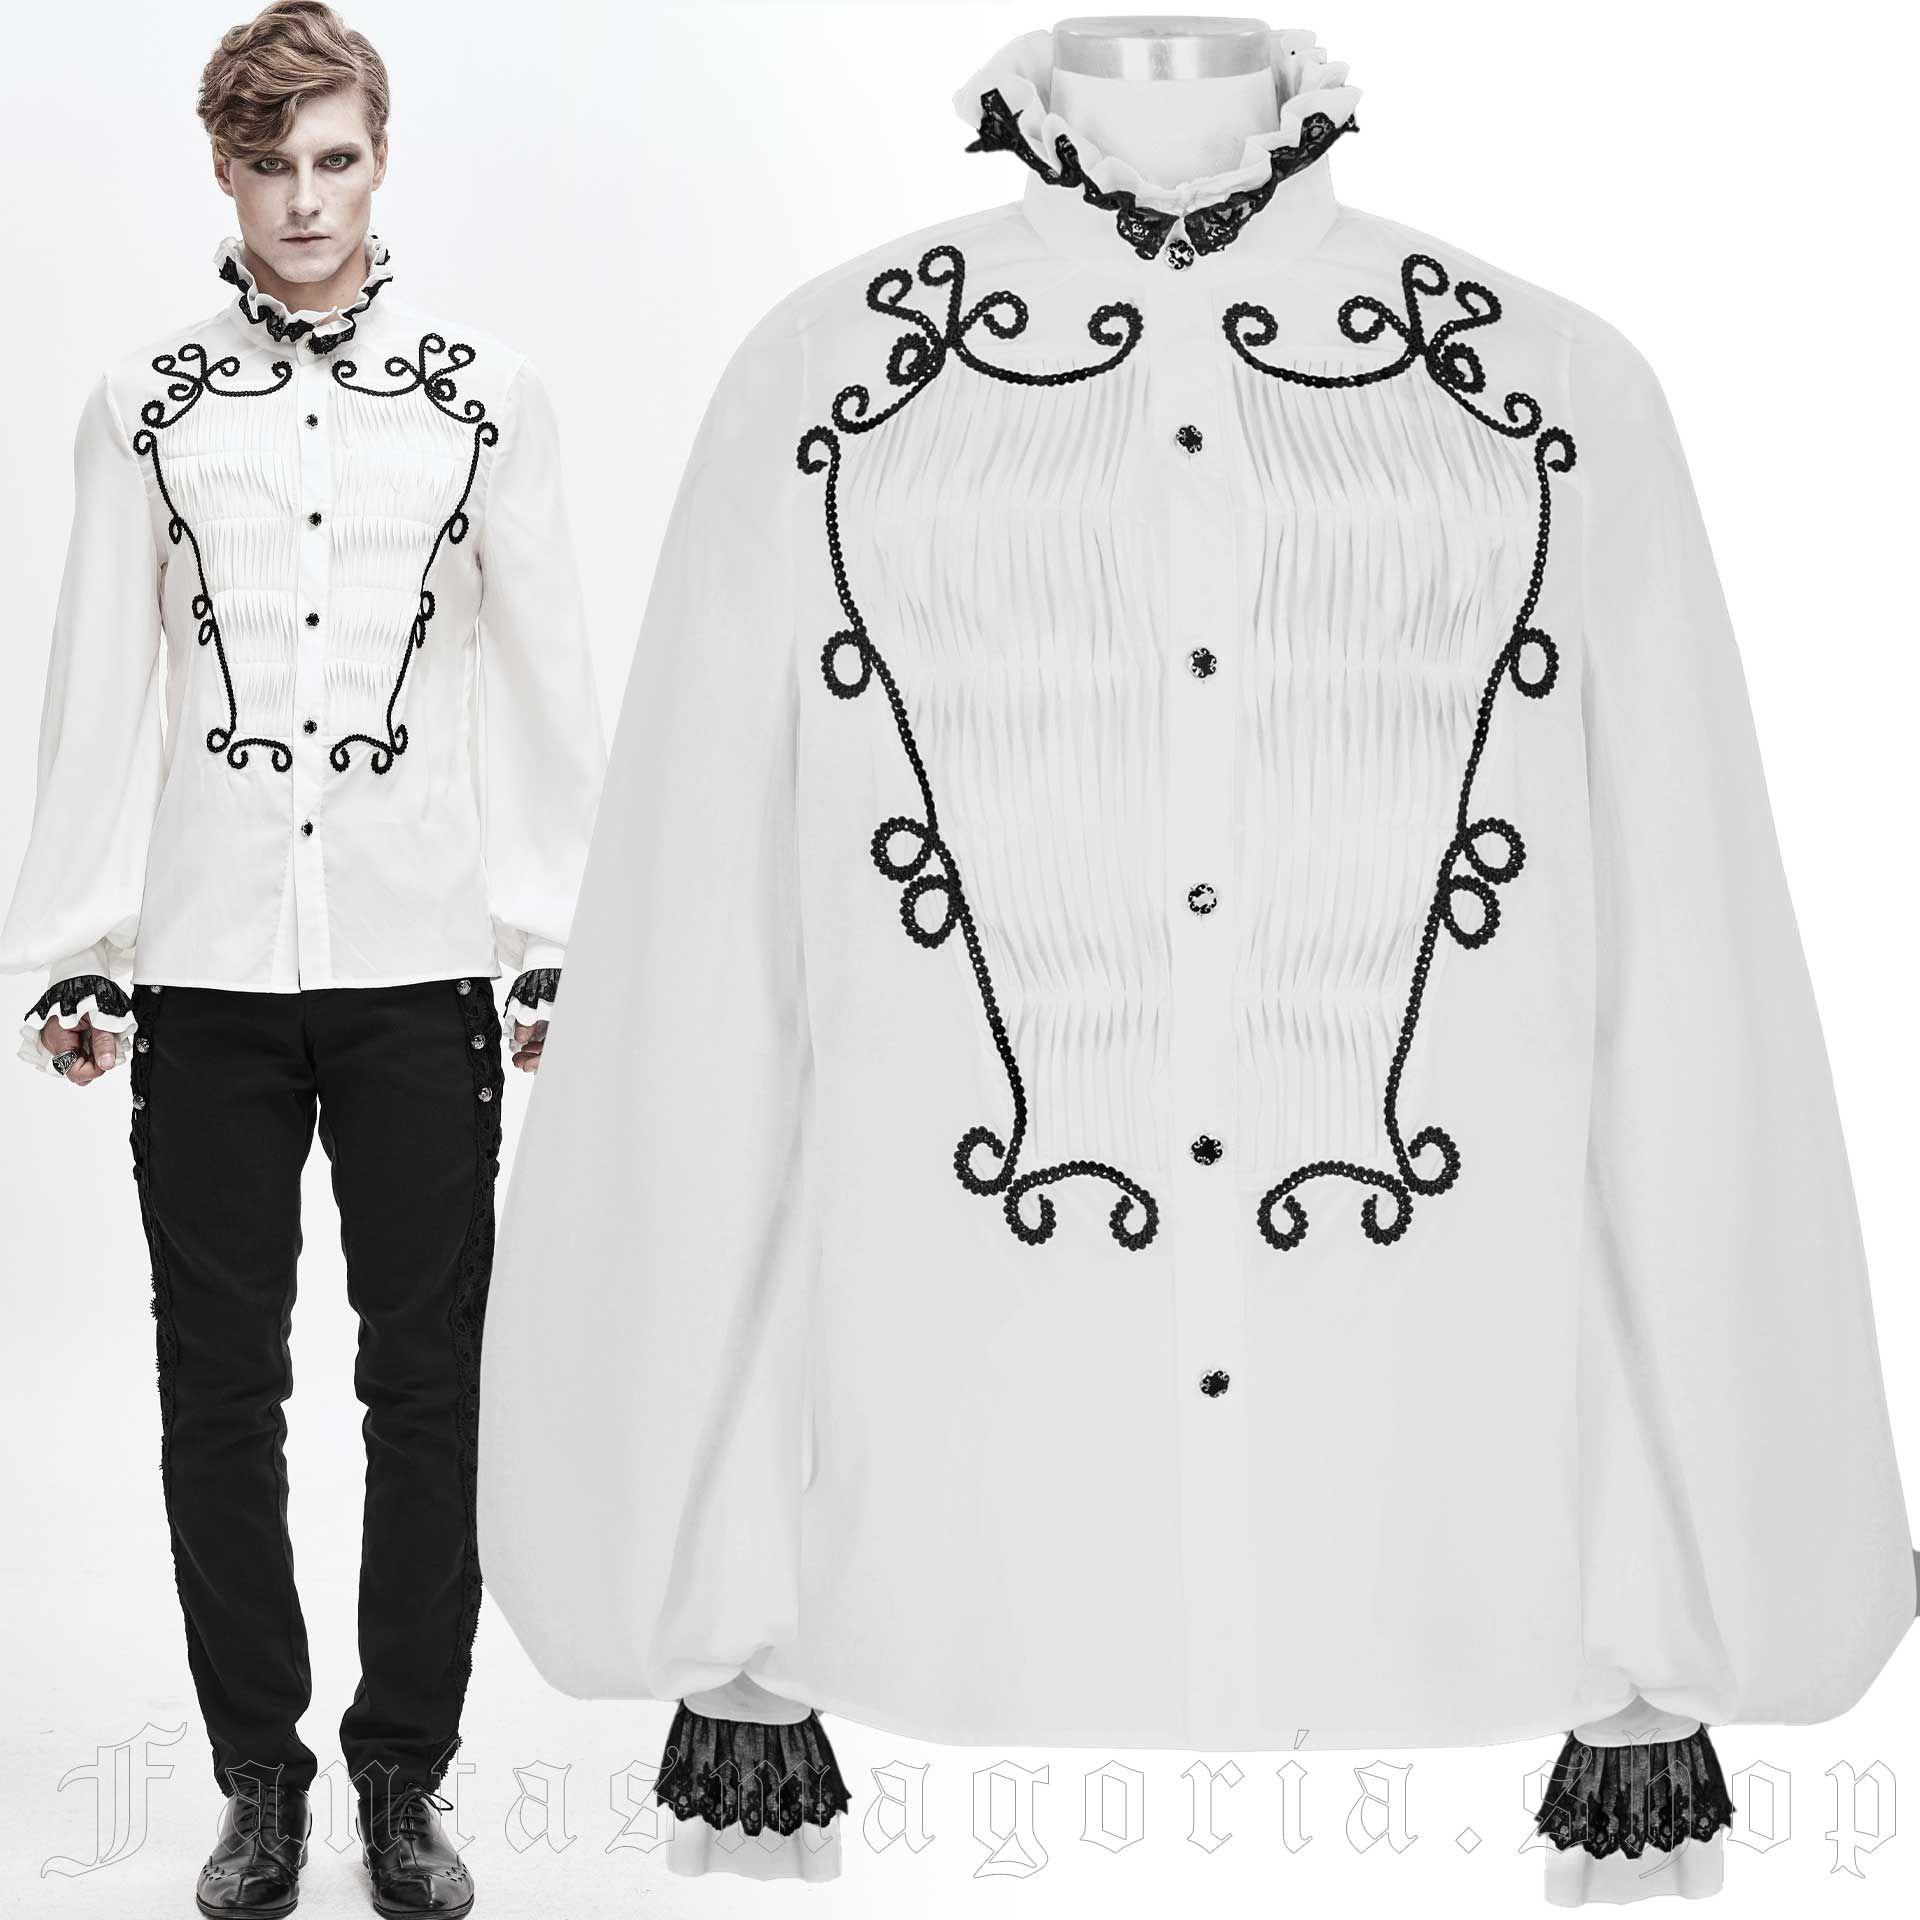 men's Phantom White Shirt by DEVIL FASHION brand, code: SHT04202